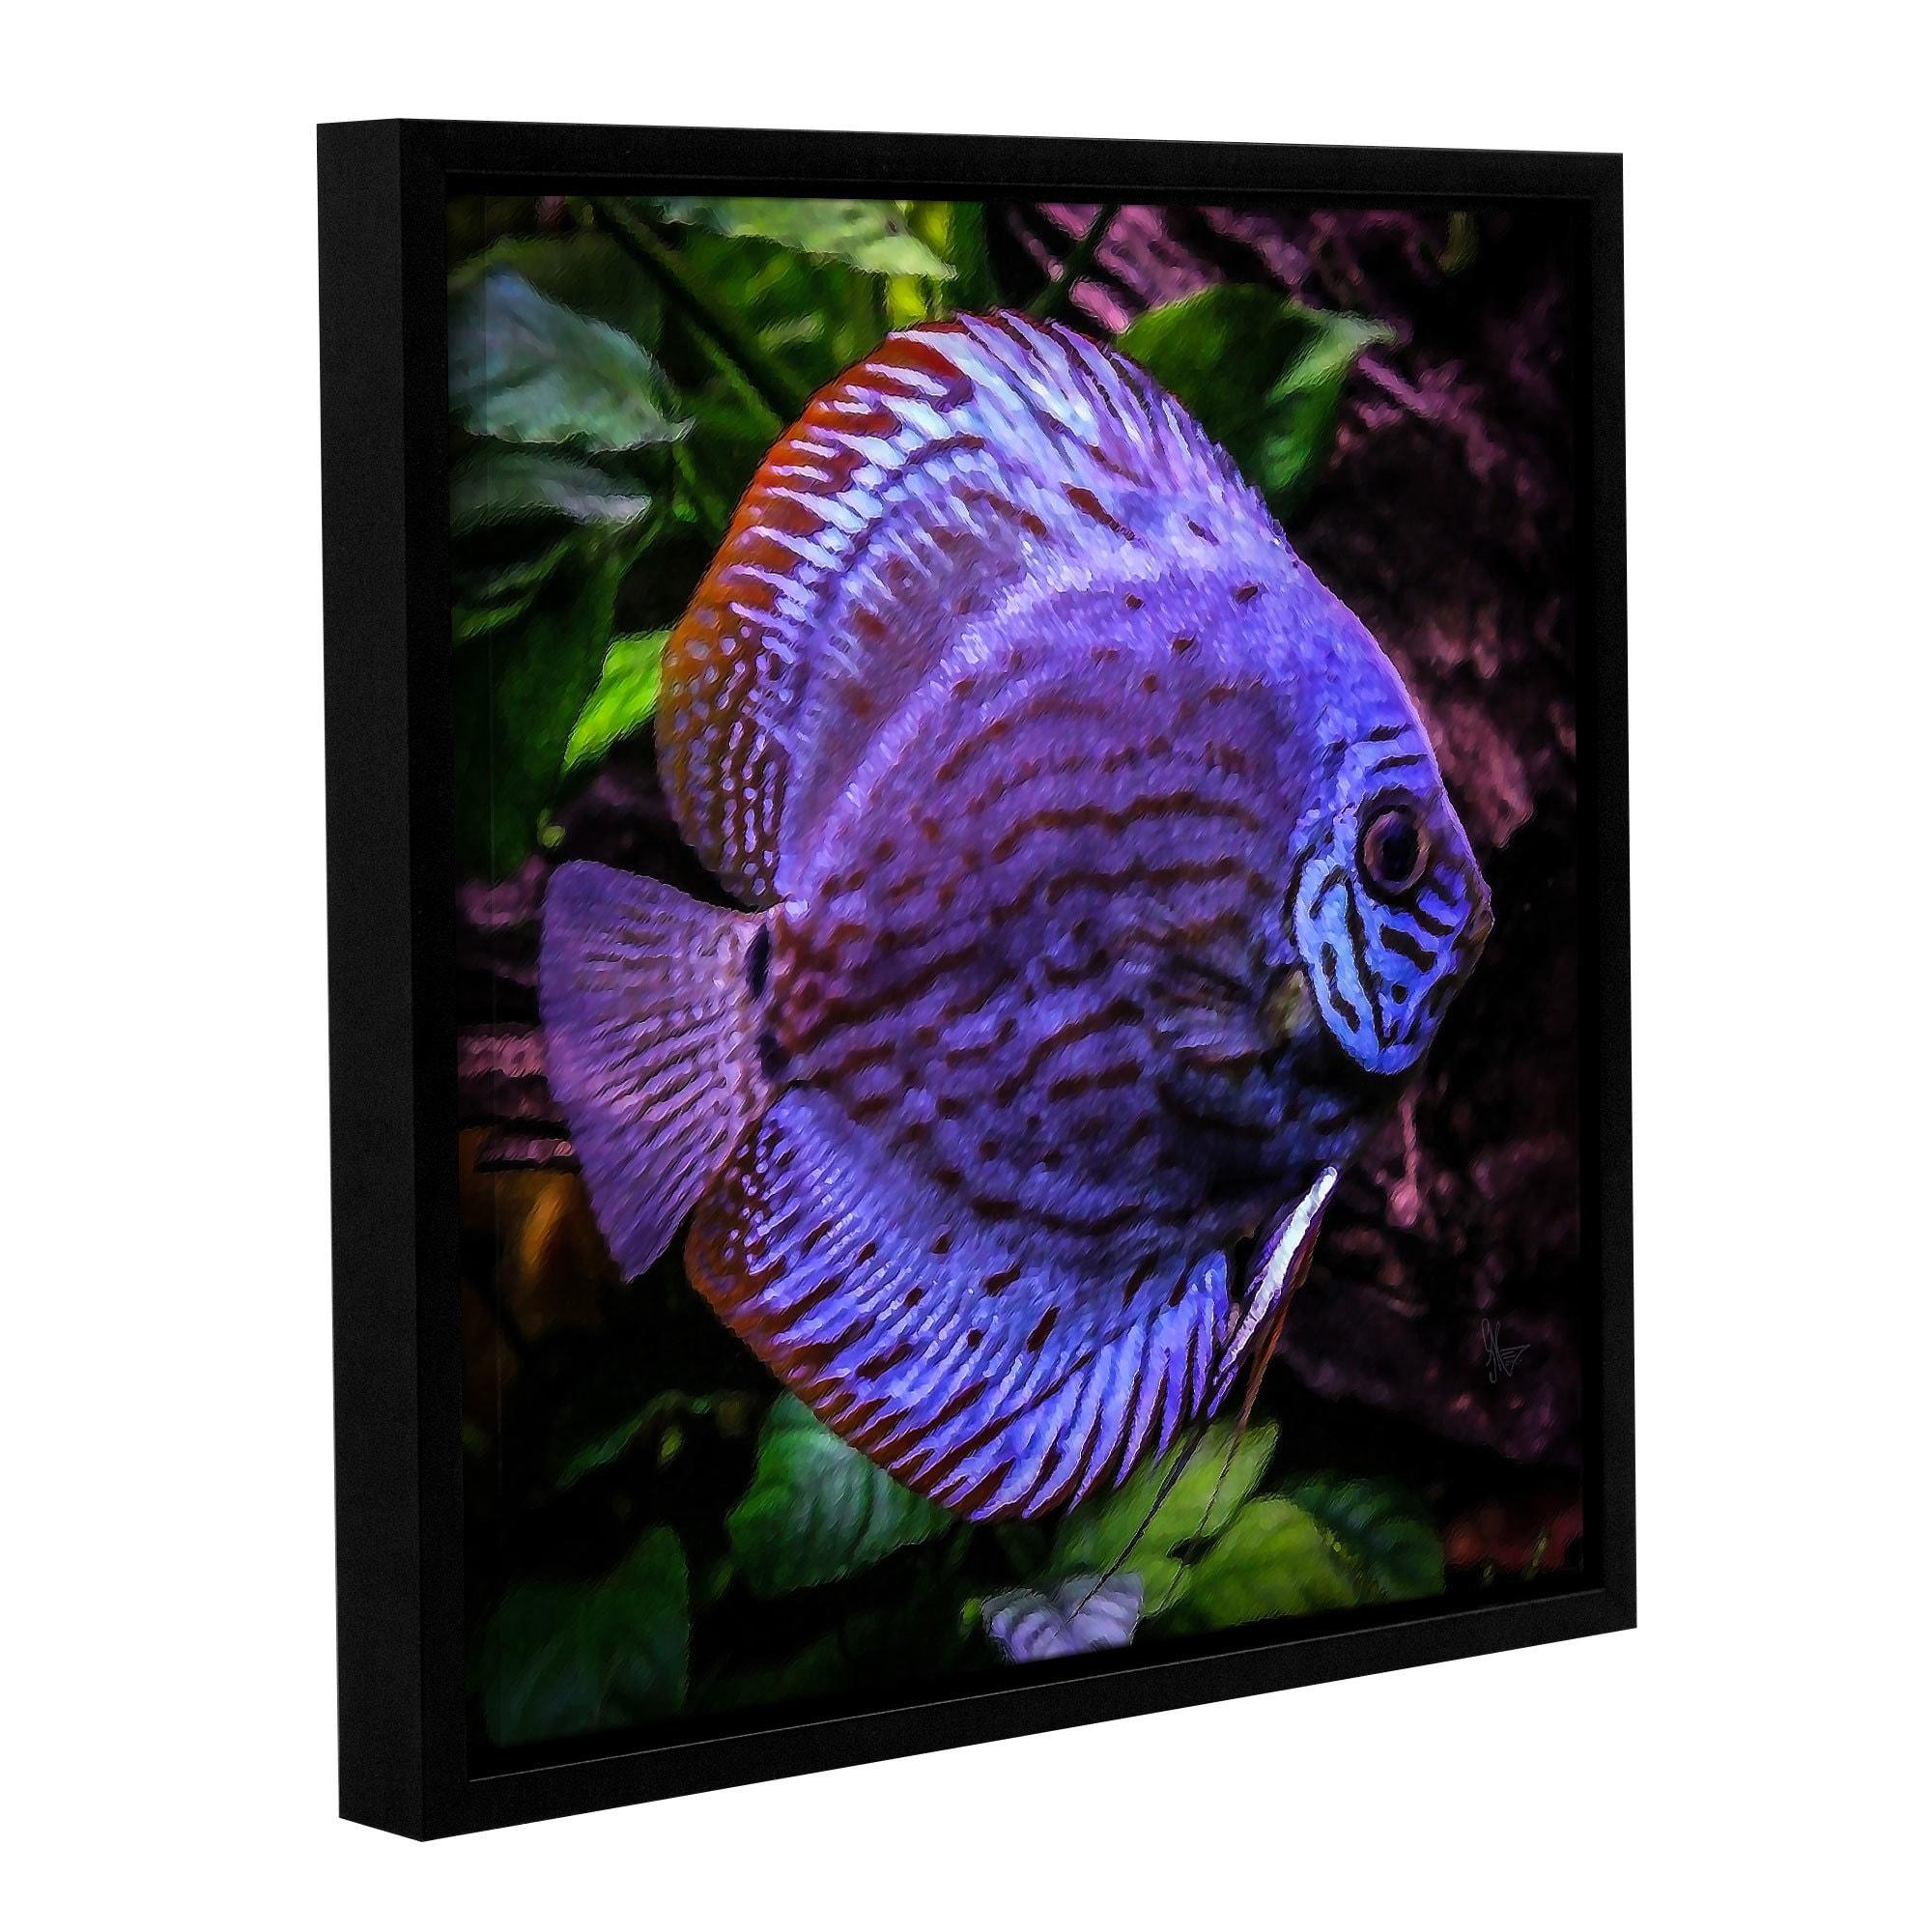 ArtWall Scott Medwetz 'Discus Fish' Canvas Gallery-wrappe...